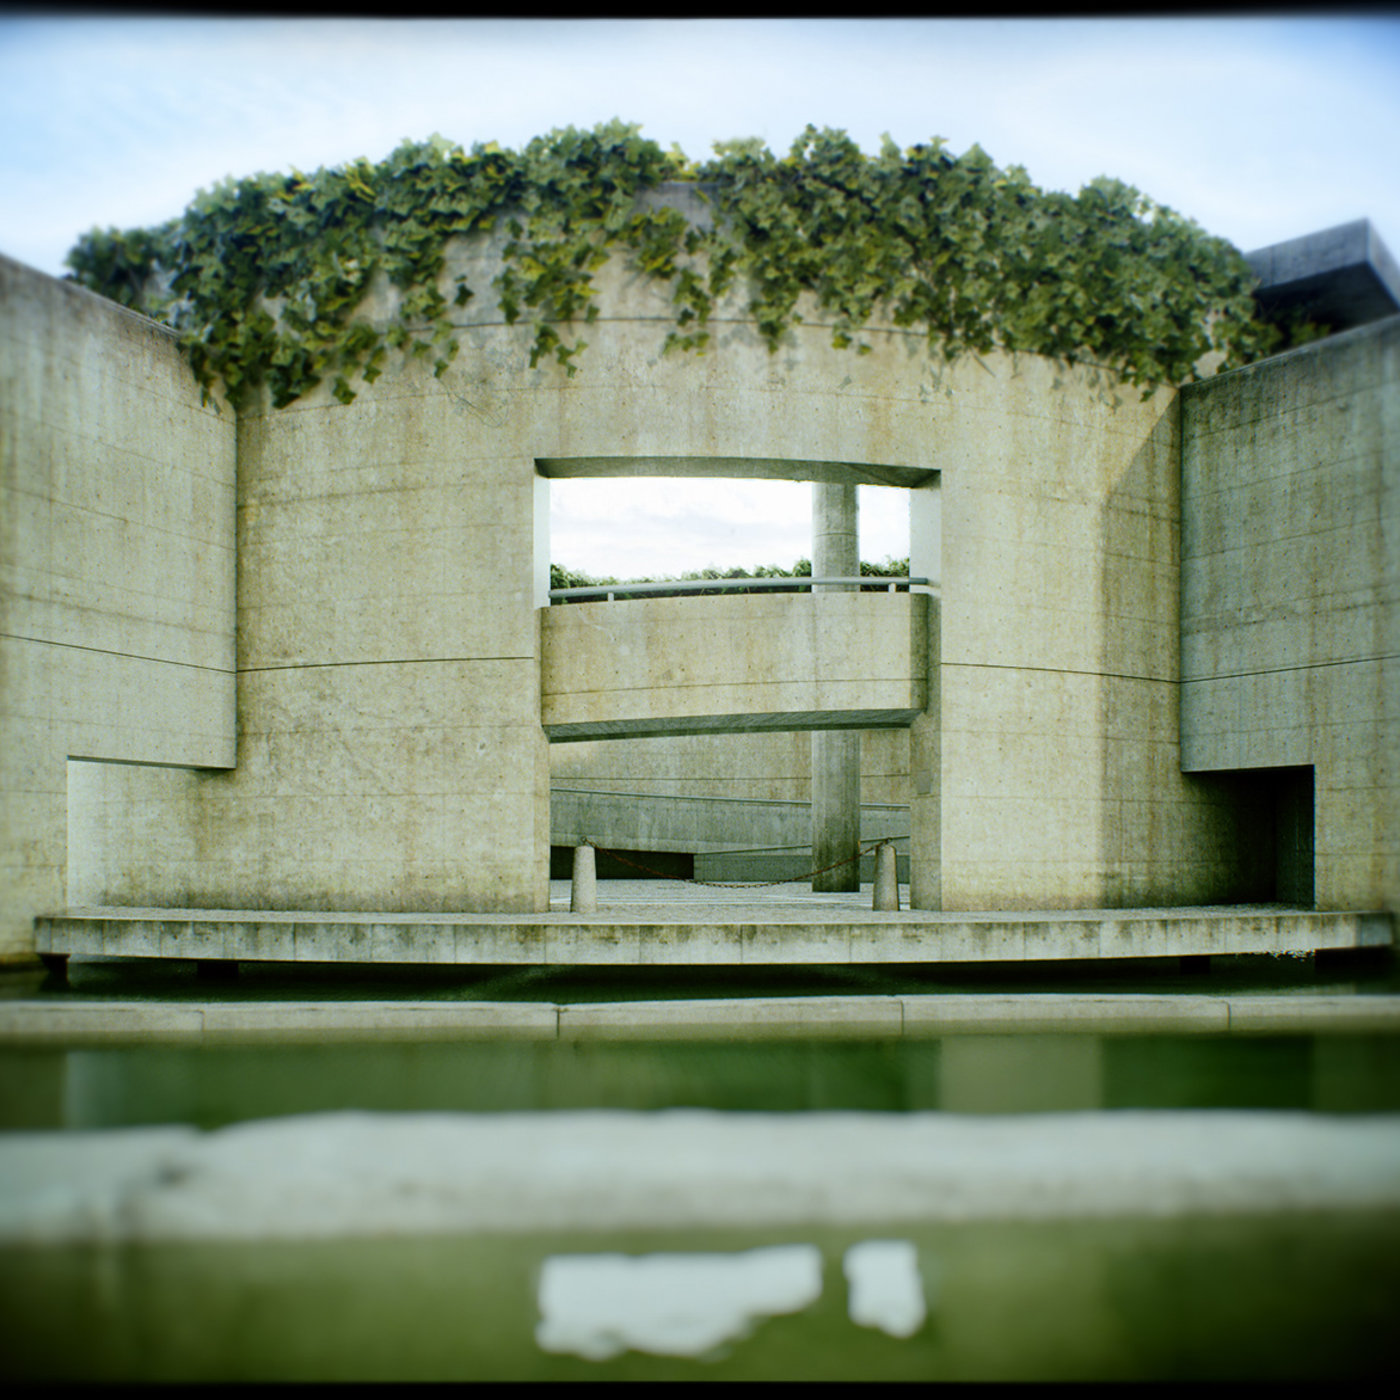 The Sayamaike Museum